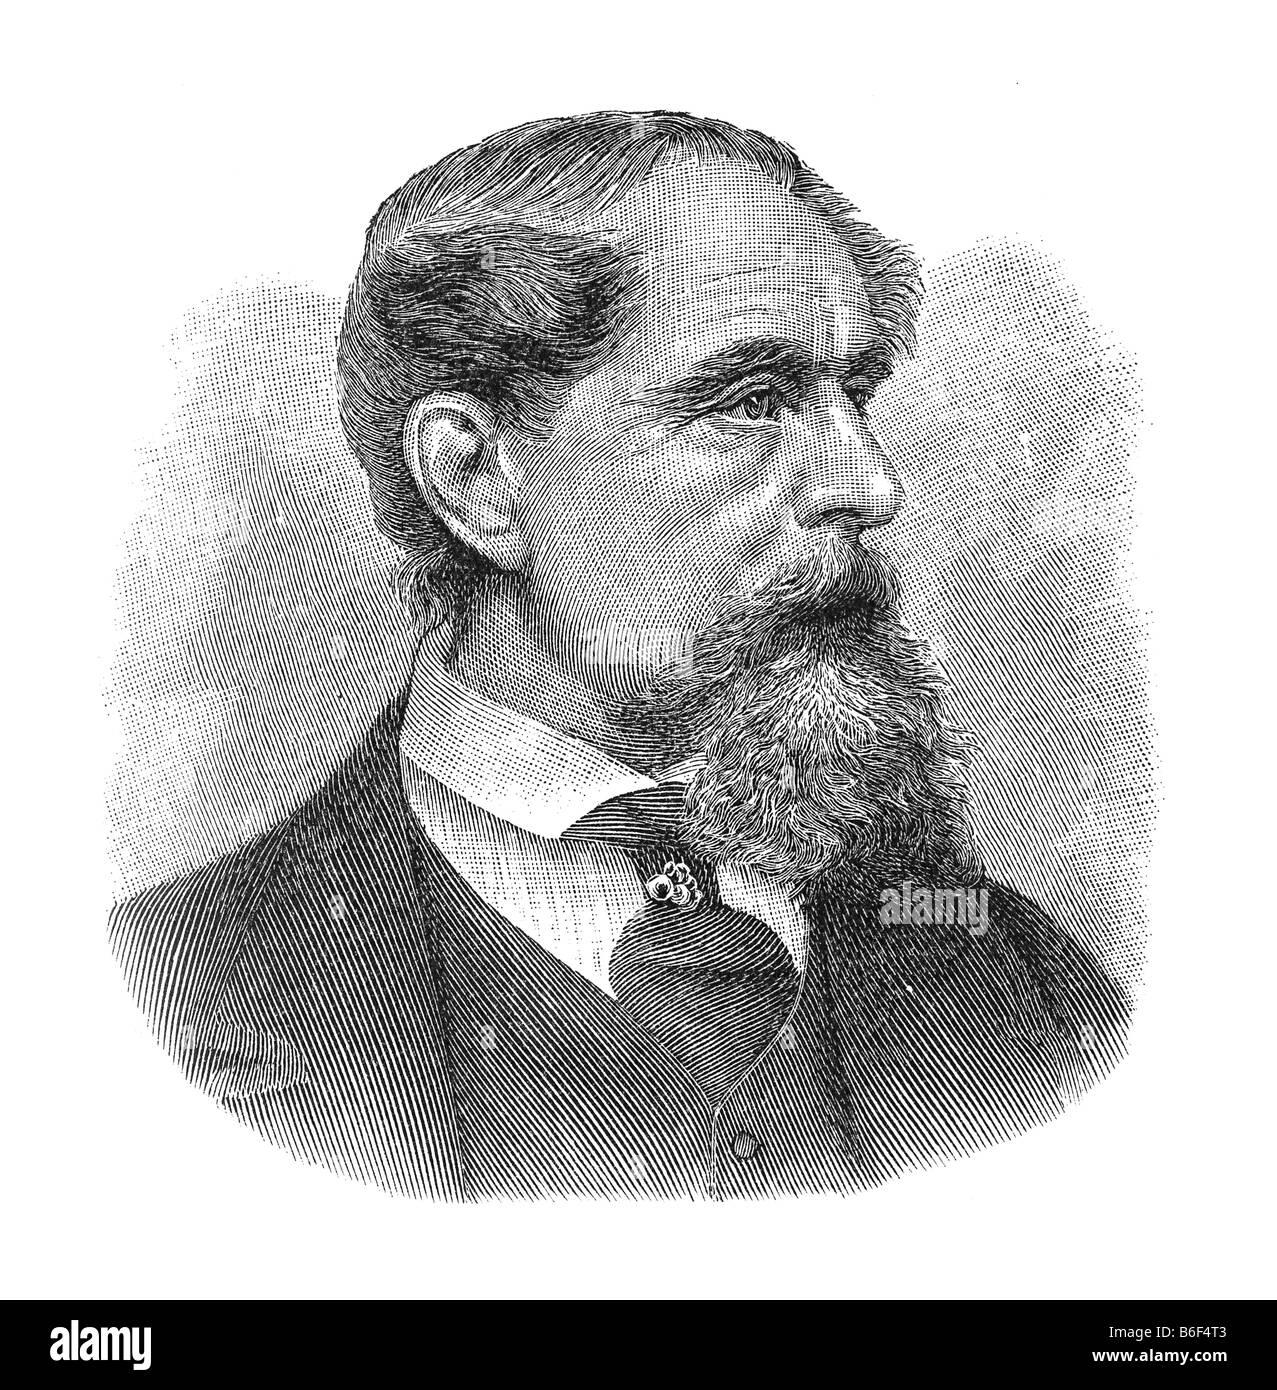 Charles John Huffam Dickens, pen-name Boz, February 1812 Landport Portsmouth, England - 9. Juni 1870 Gad's Hill - Stock Image